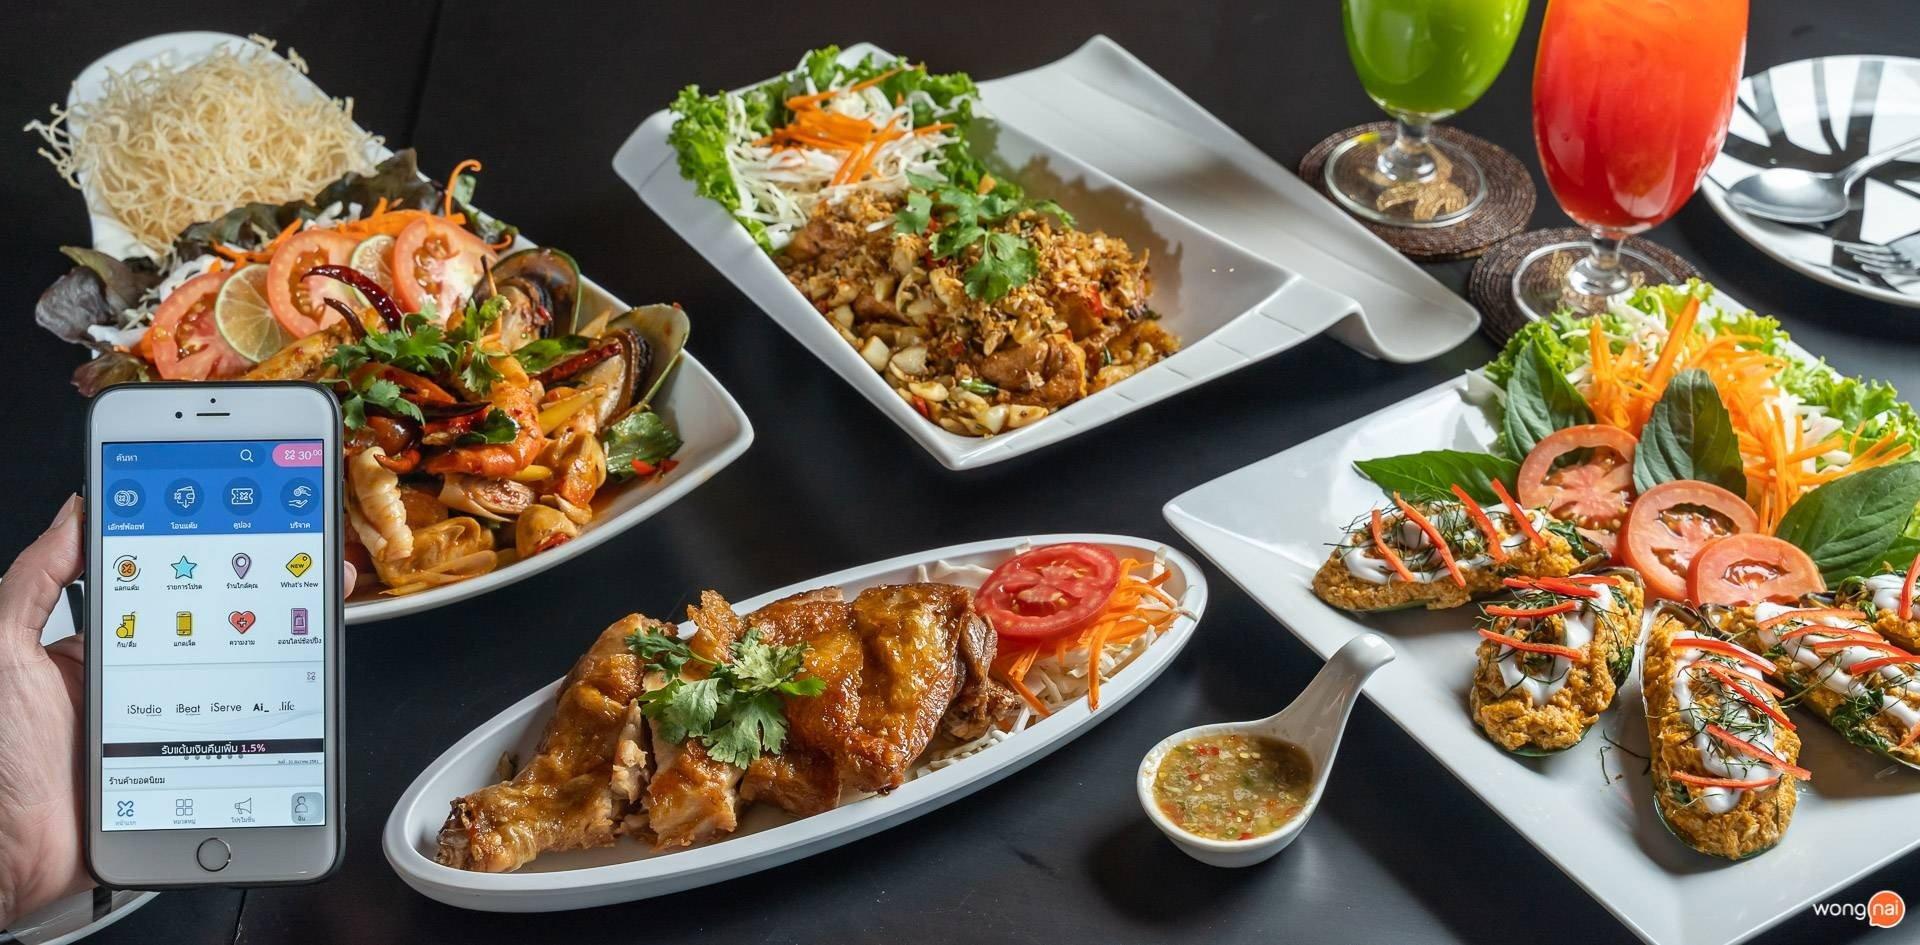 Medee Thai Cuisine Silom 19 alley